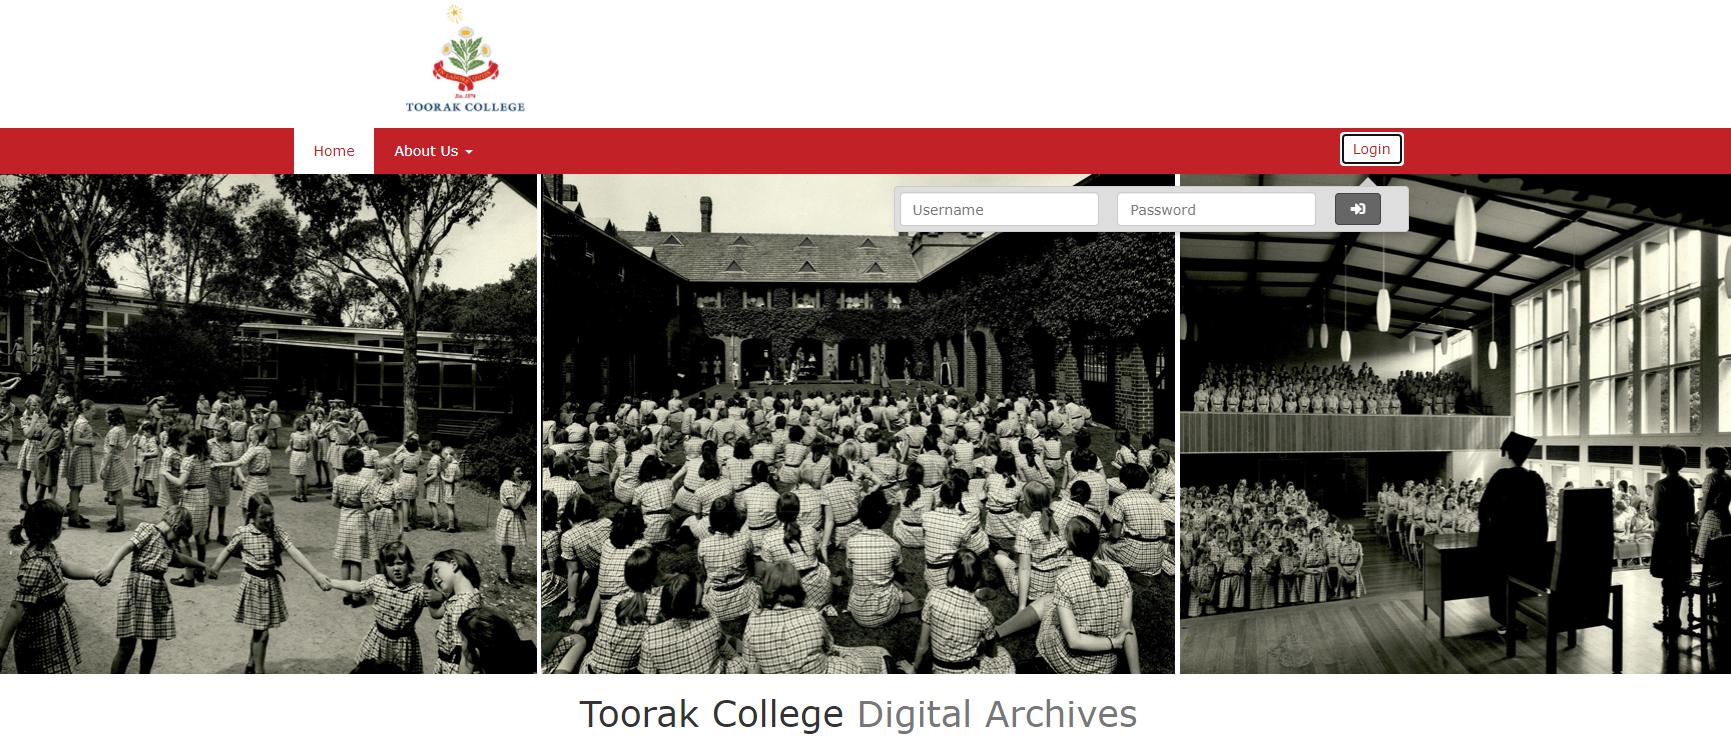 Archives Website Screenshot 2